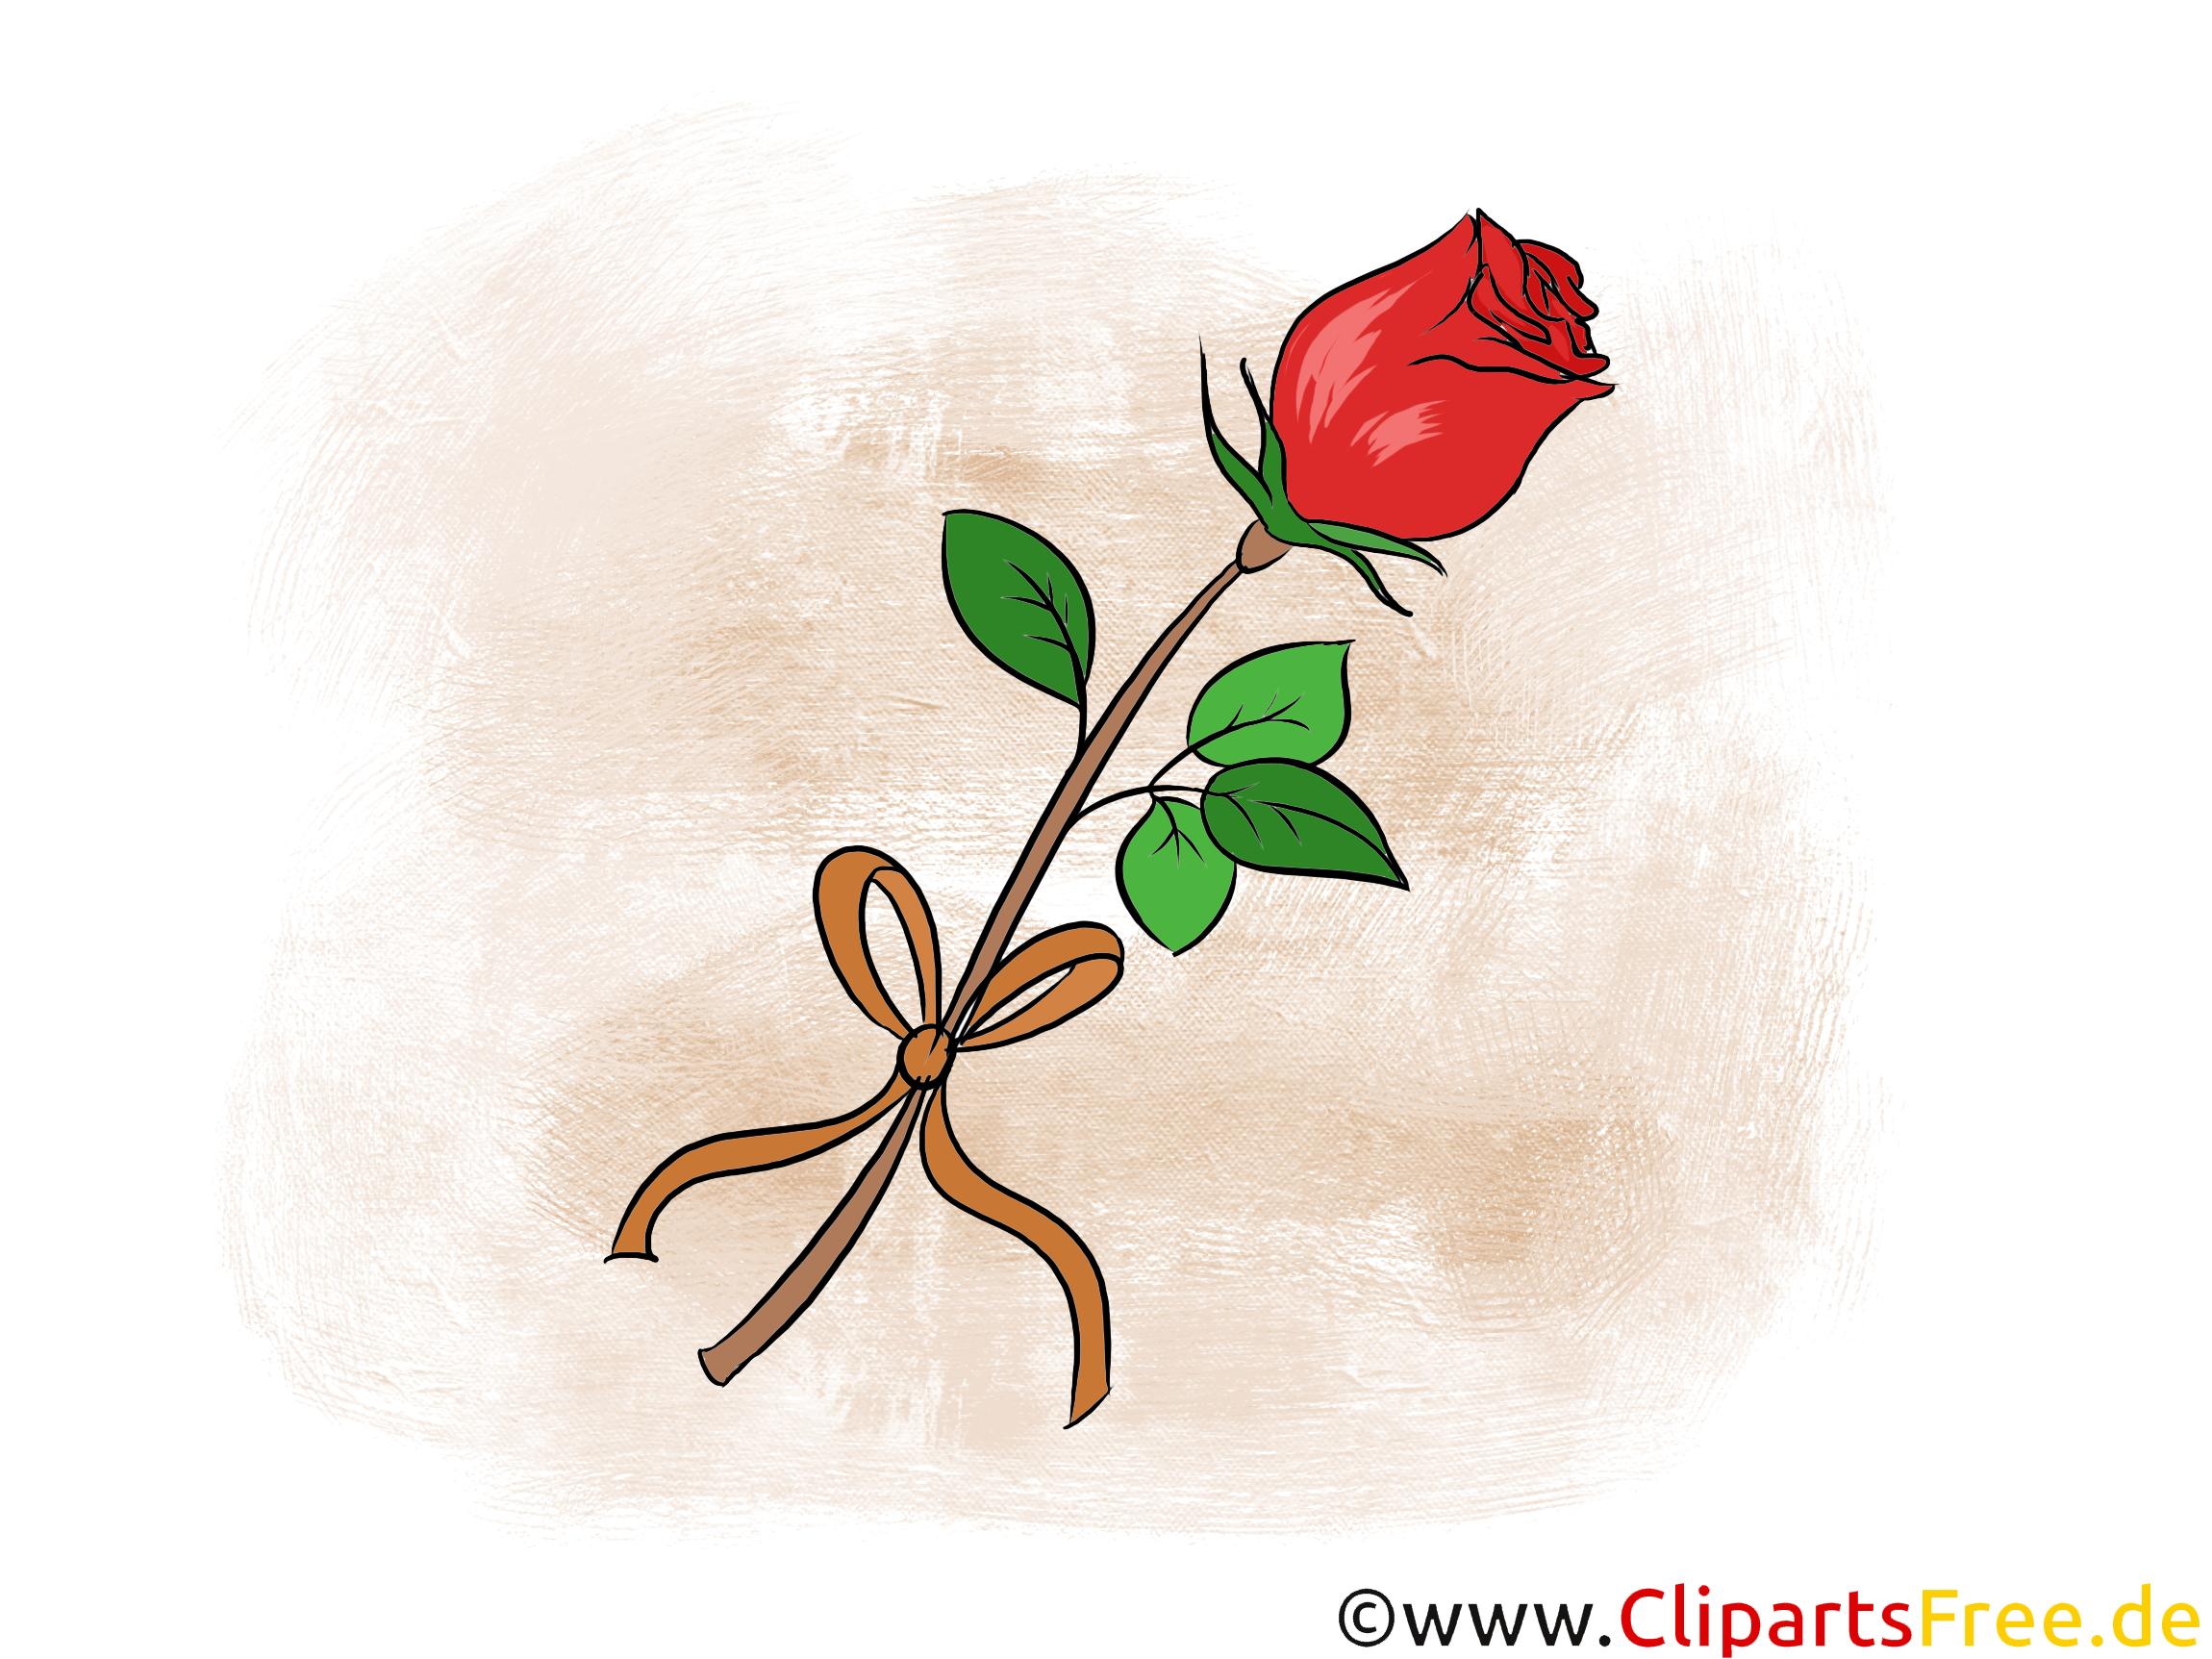 Schöne rote Rose Clipart, Bild, Illustration, Grafik